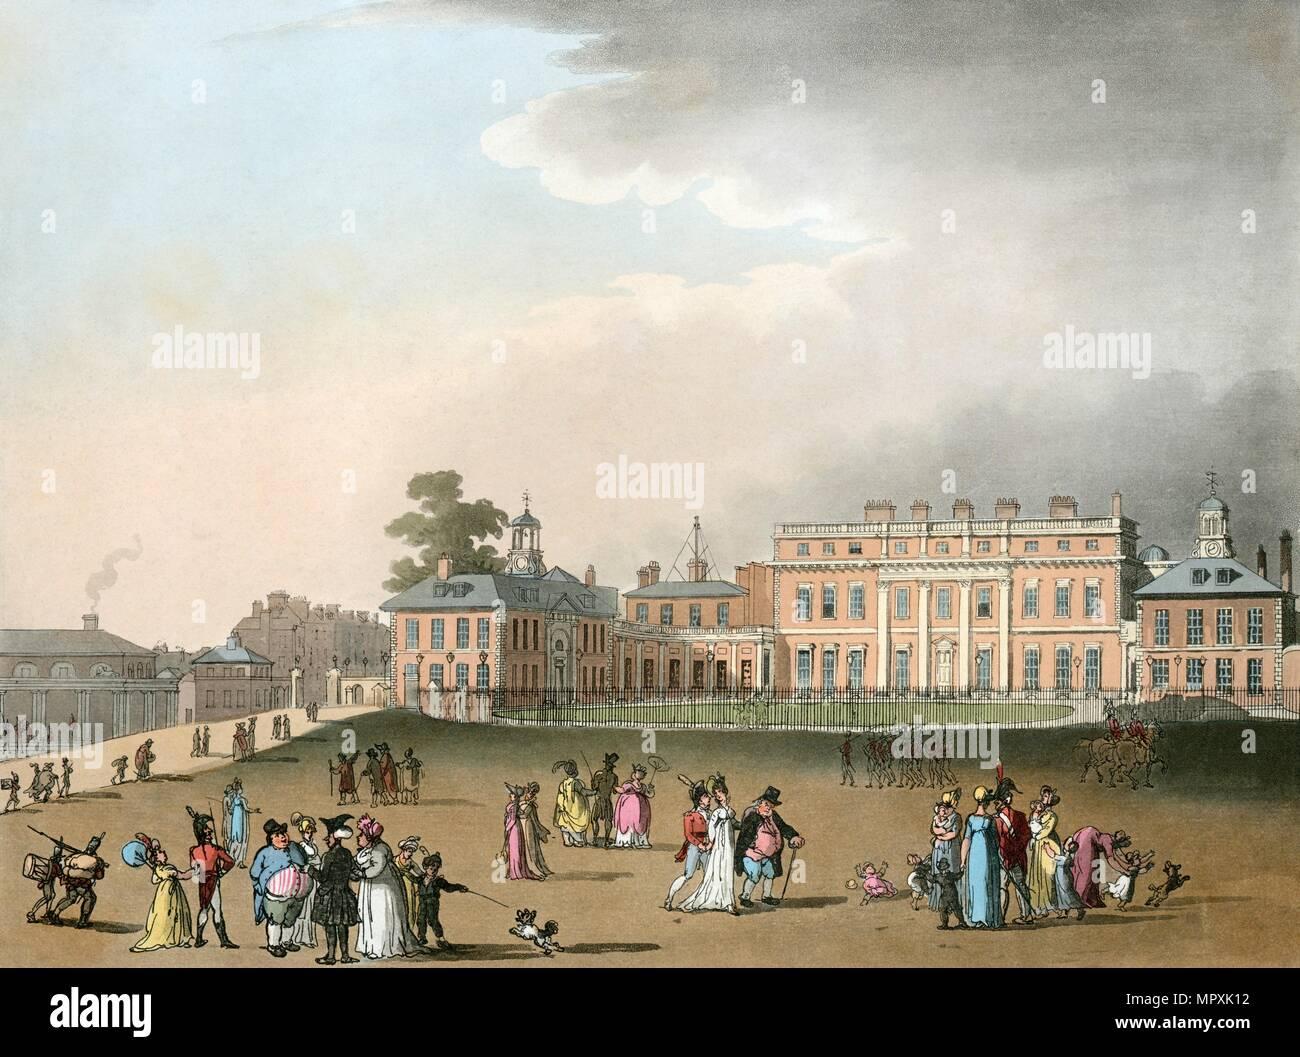 Buckingham Palace, London, 1809. Artist: Augustus Charles Pugin. - Stock Image